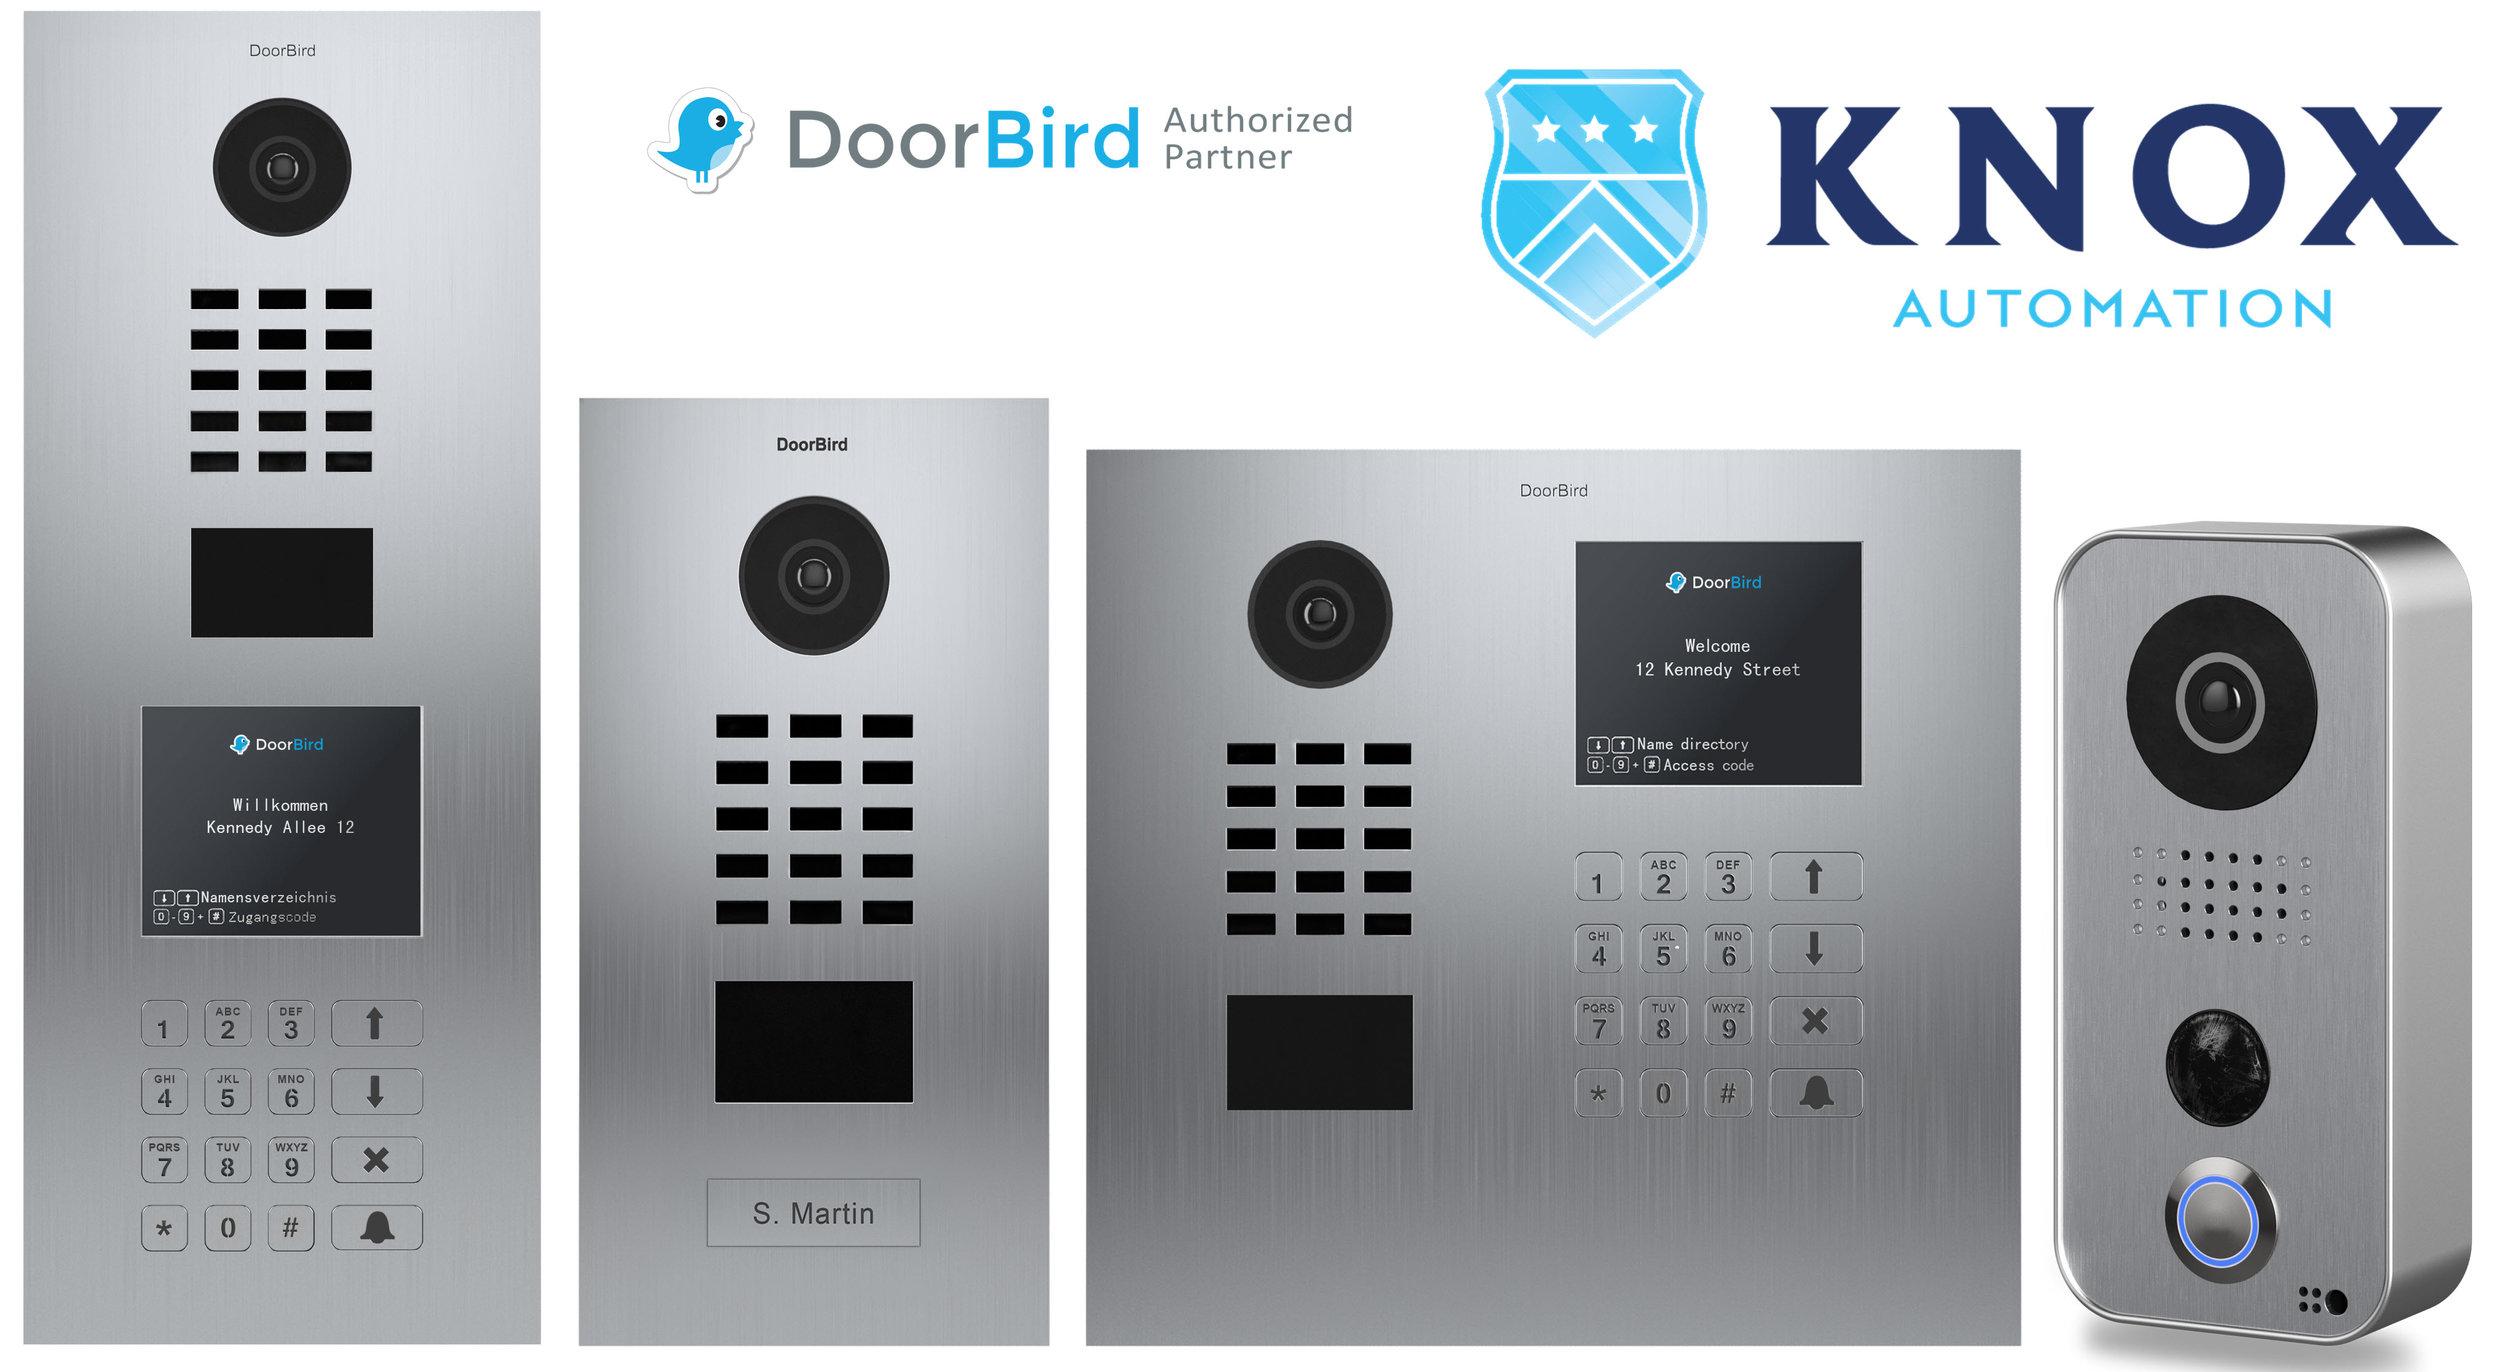 knox_doorbird3.jpg